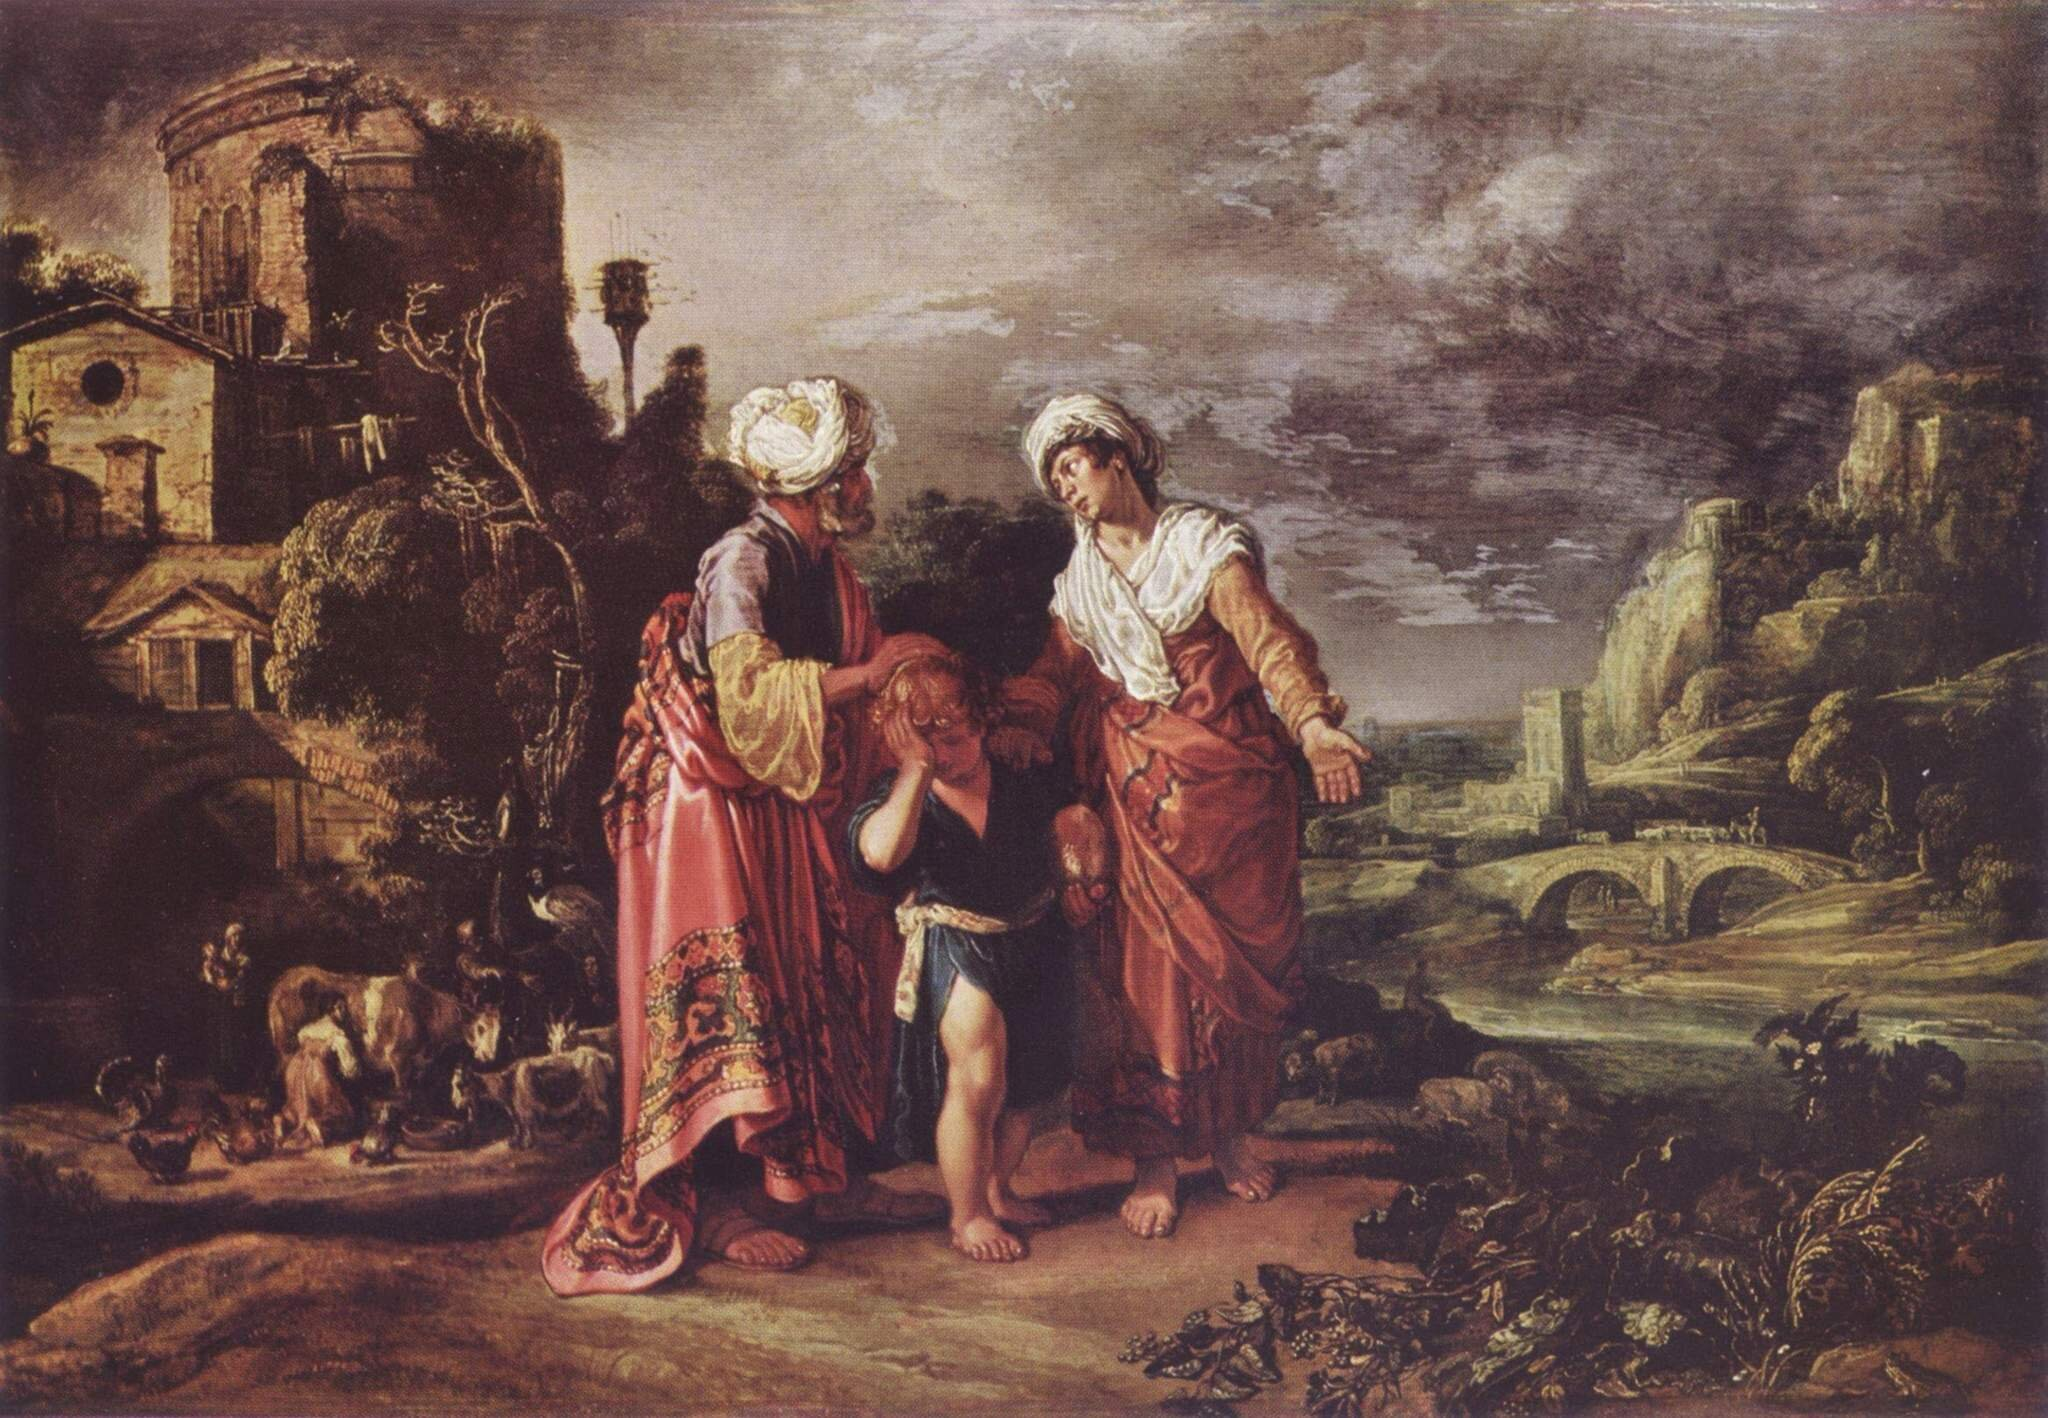 The dismissal of Hagar  by  Pieter Pietersz Lastman .